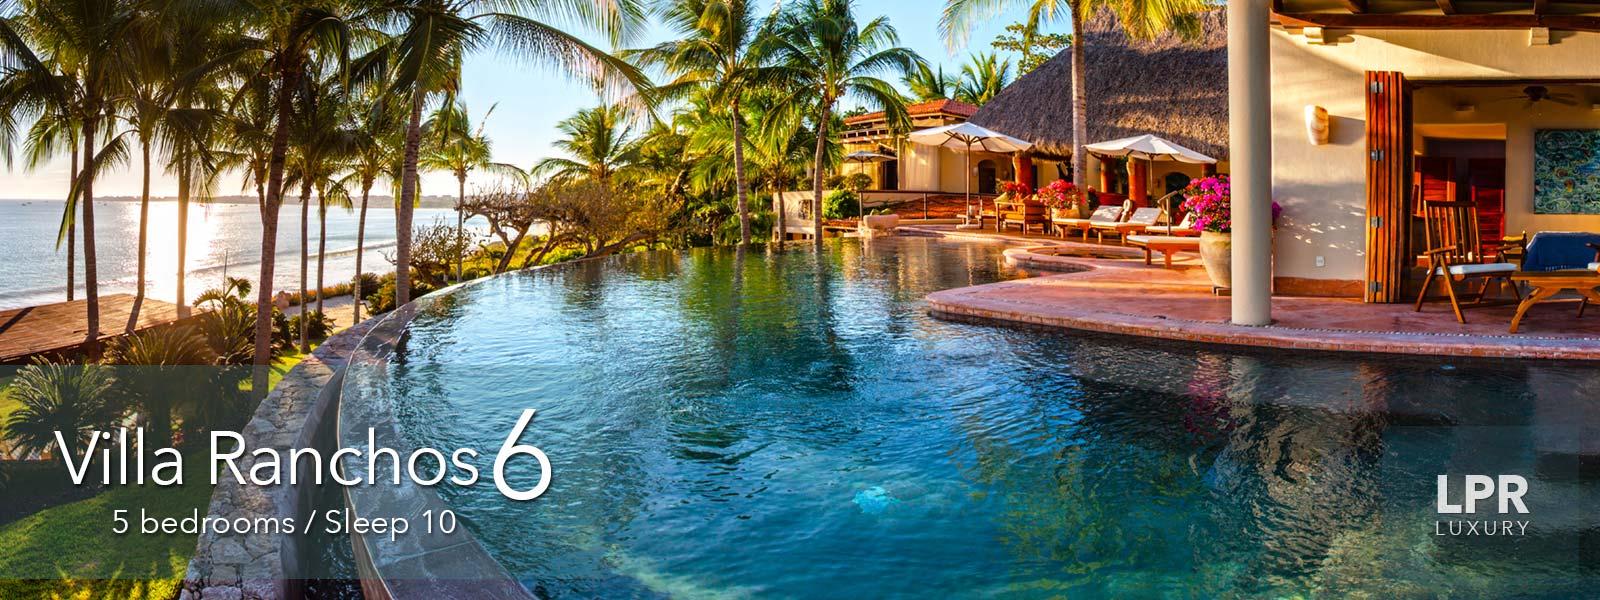 Villa Ranchos 6 at the Punta Mita Resort - Ultra Luxury Punta Mita Vacation Rentals and Real Estate